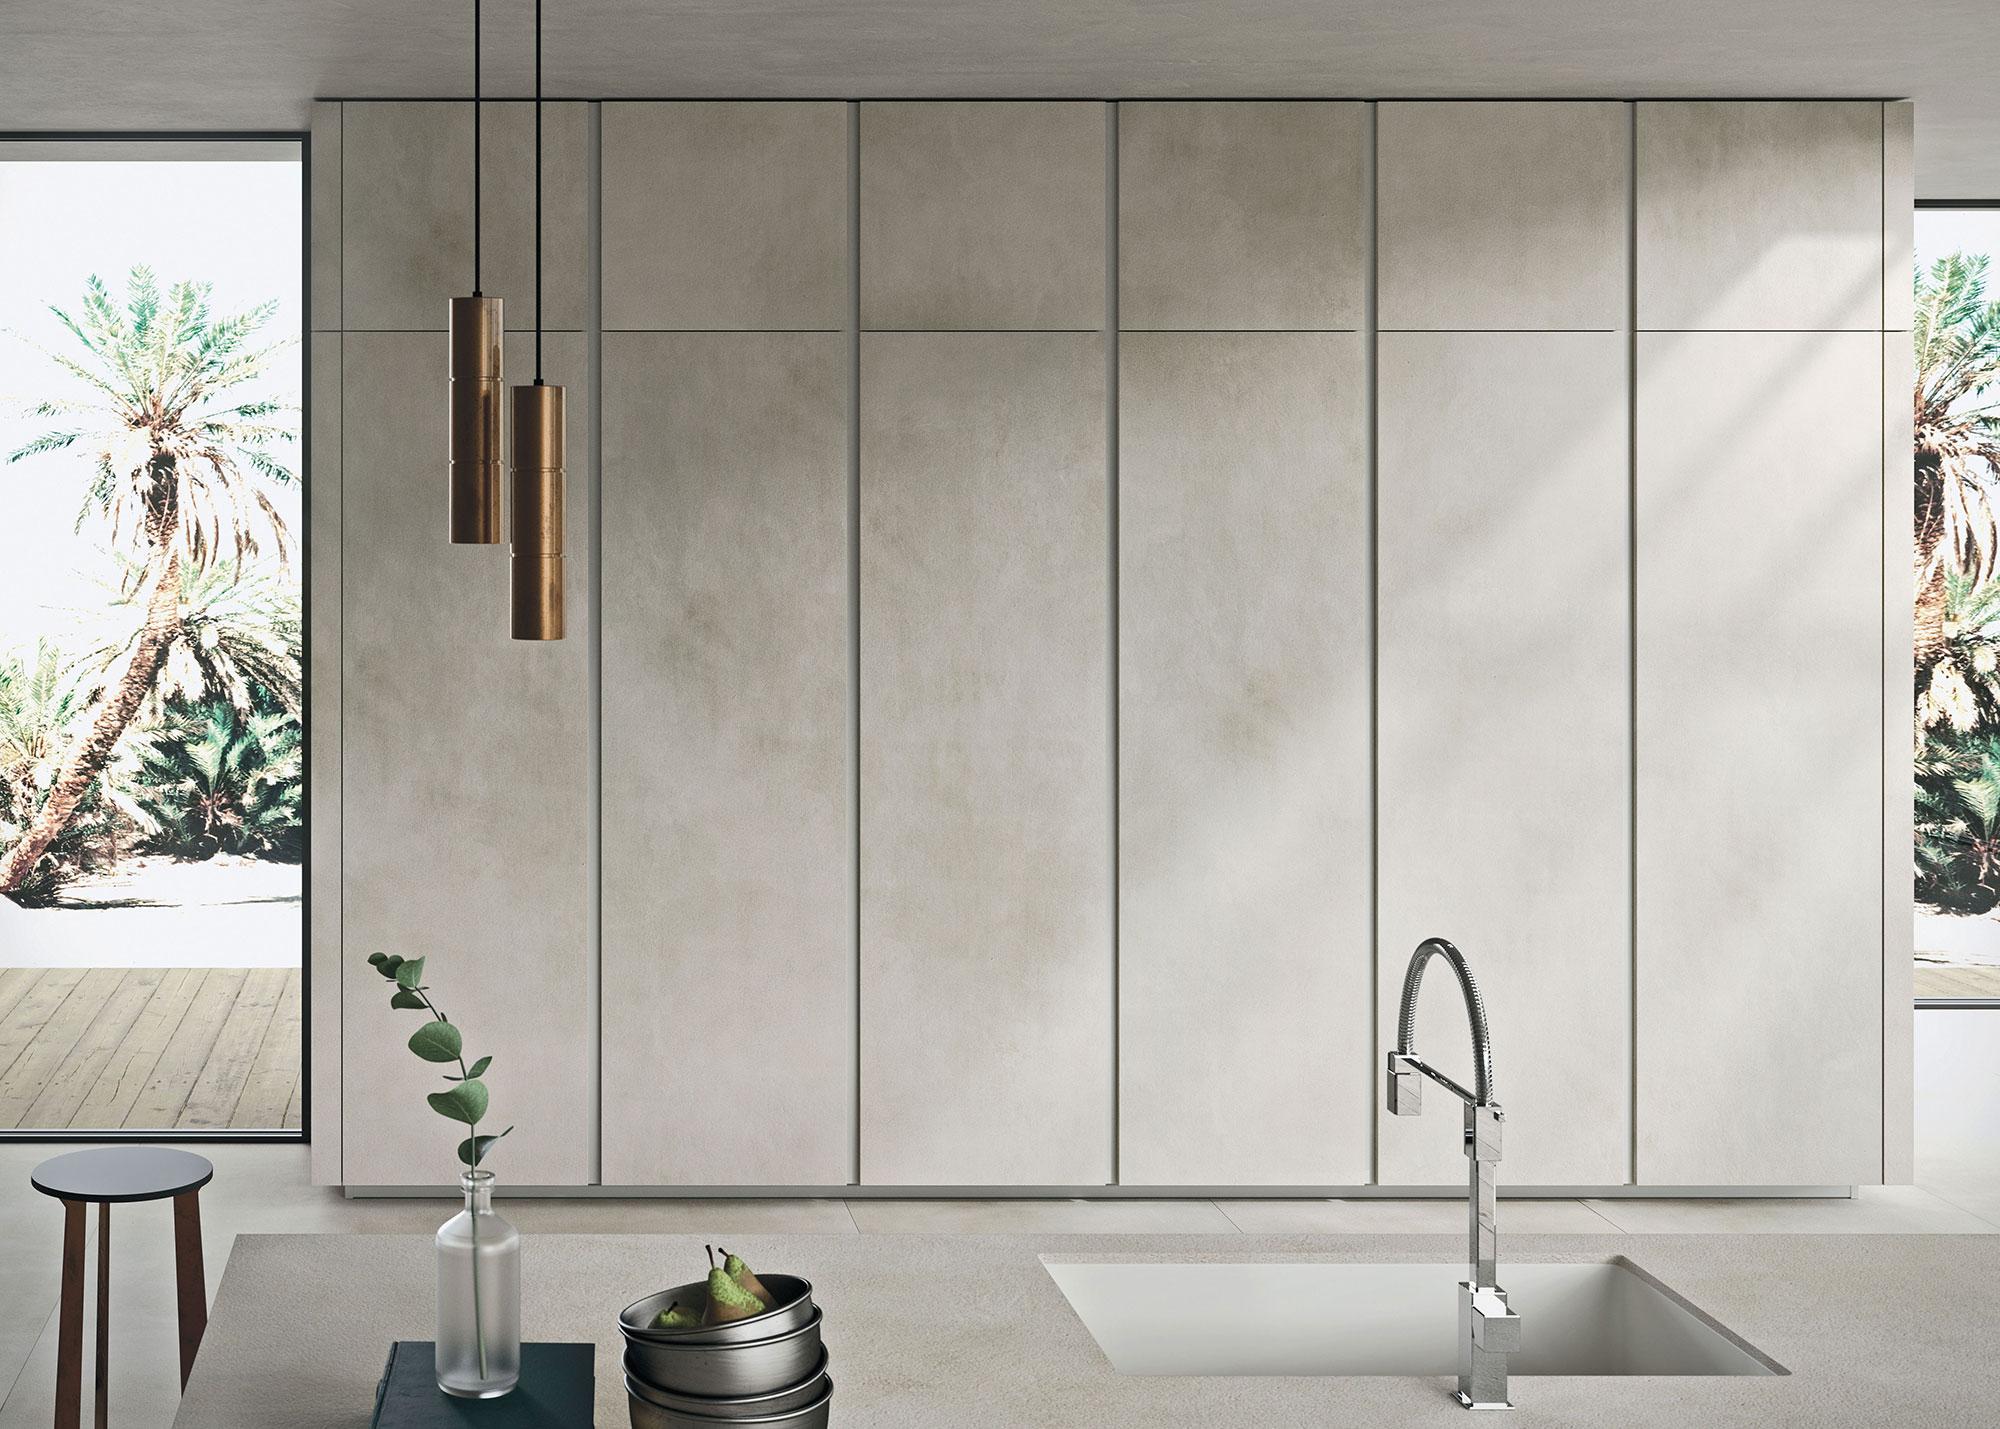 cucine-design-moderne-way-materia-snaidero-dettaglio-1